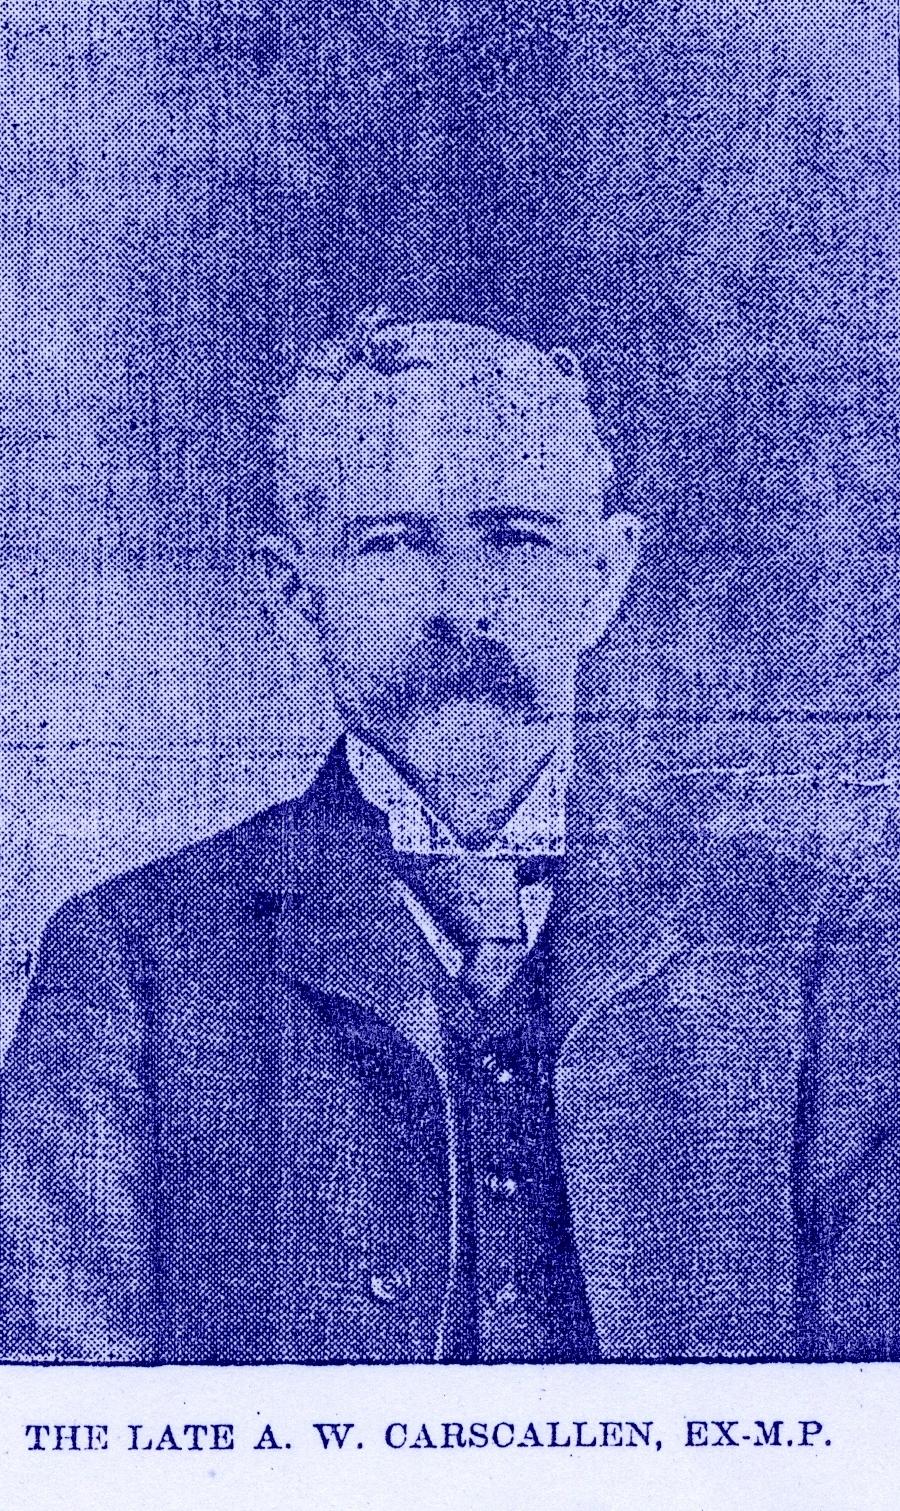 A.W. Carscallen, M.P. 1844-1907